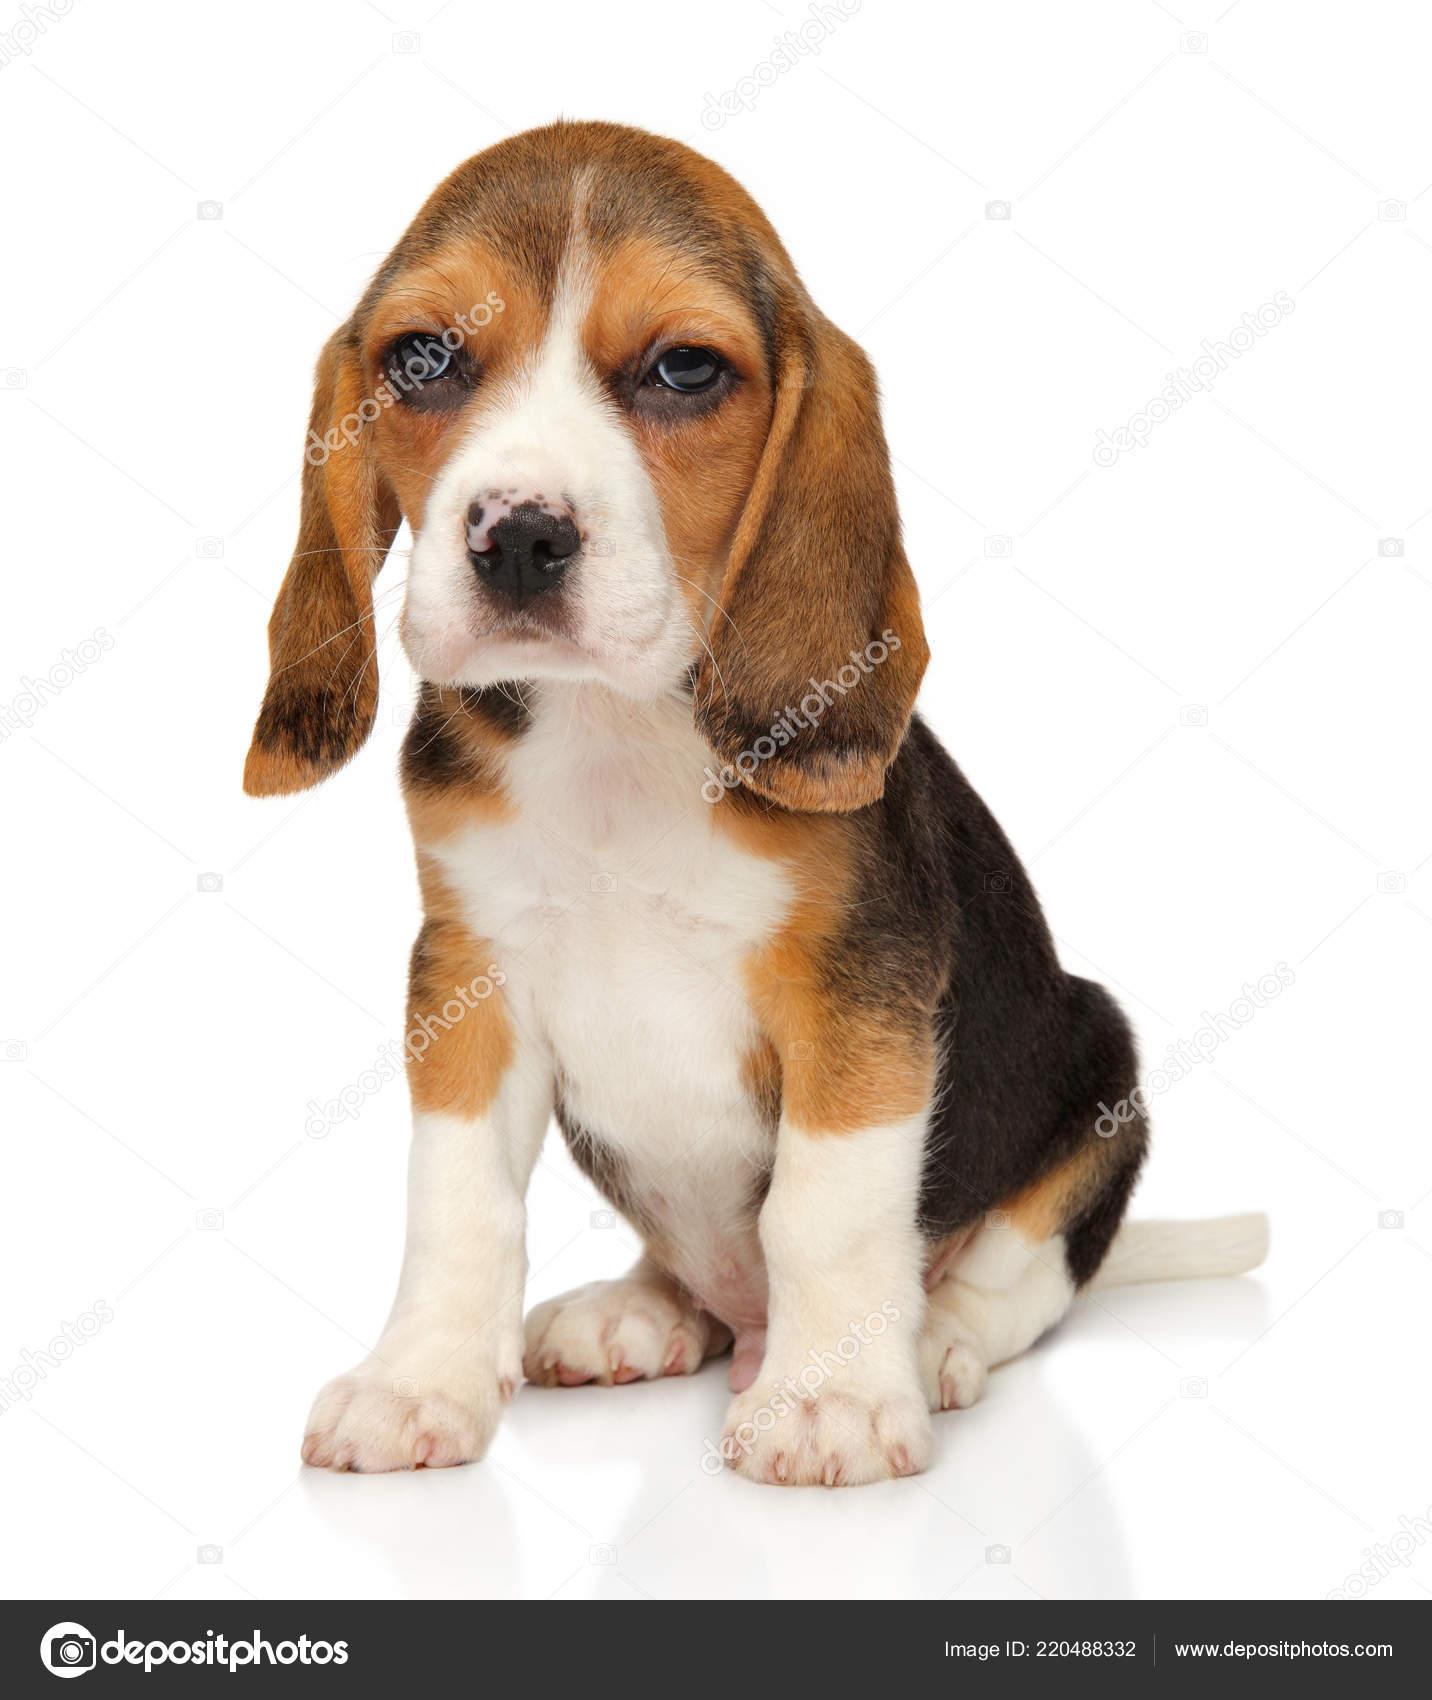 Pmages Baby Beagles Beagle Puppy Sits White Background Baby Animal Theme Stock Photo C Fotojagodka 220488332